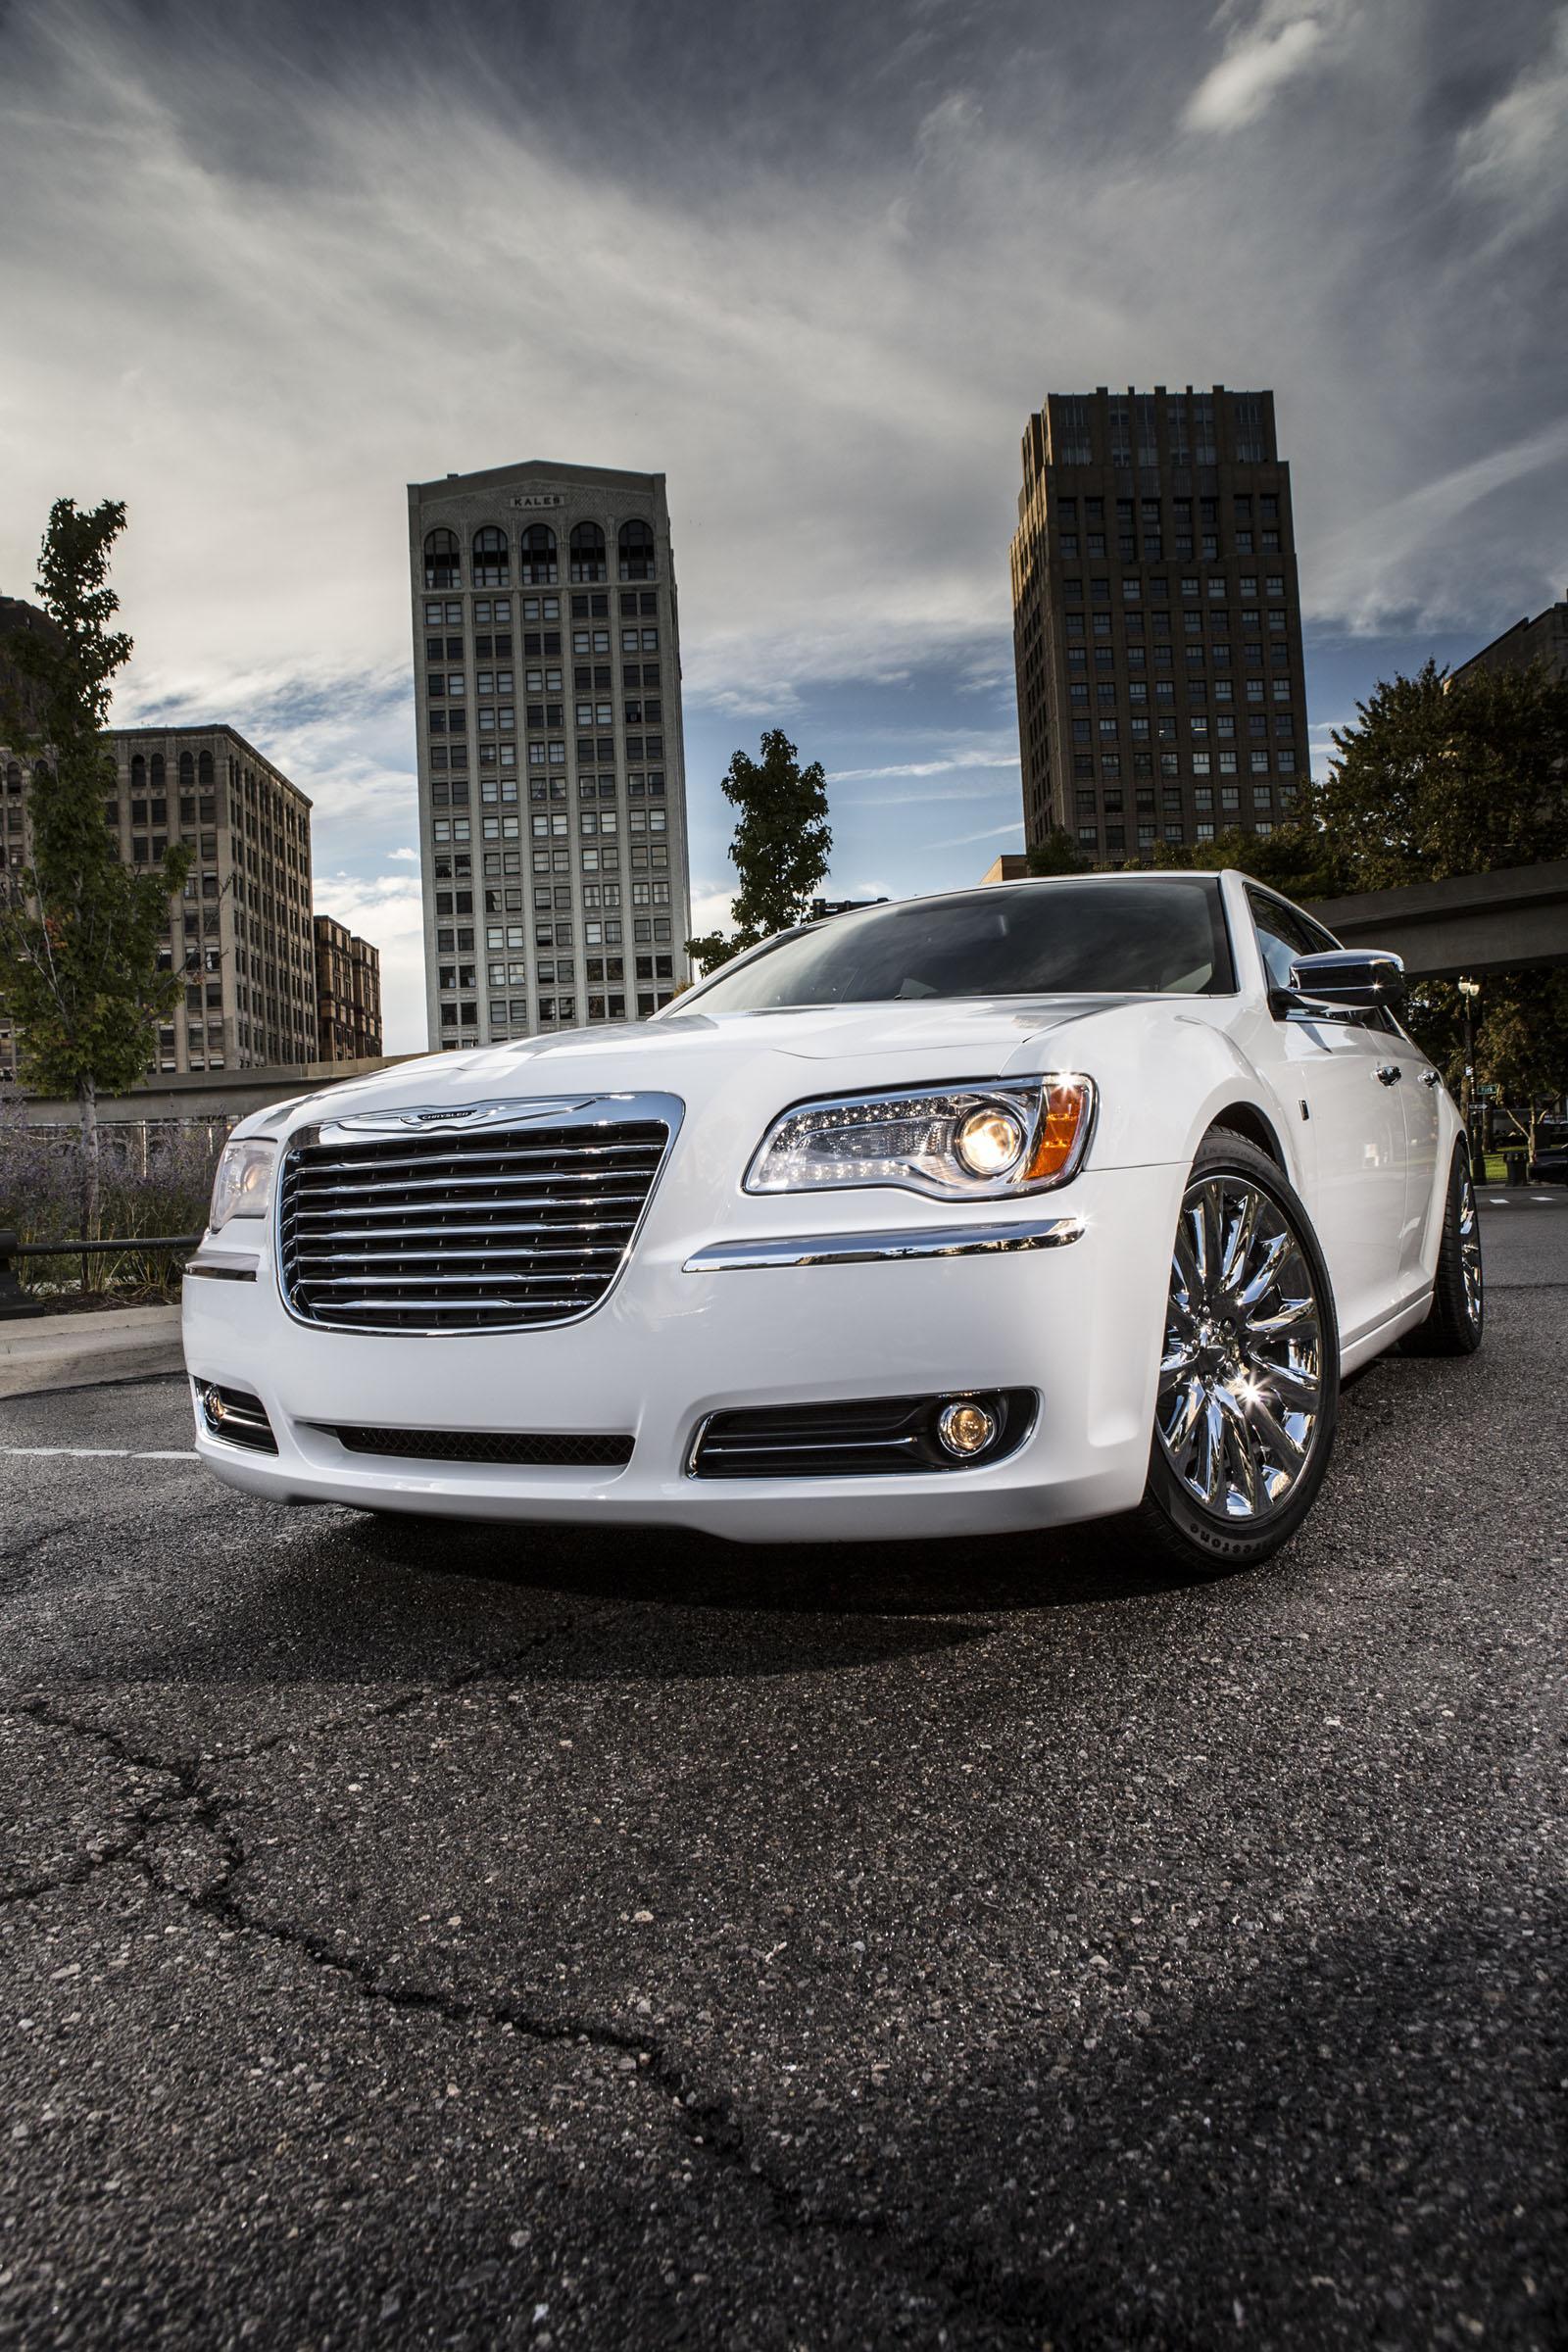 2013 Chrysler 300 Motown Edition - US Price $32,995